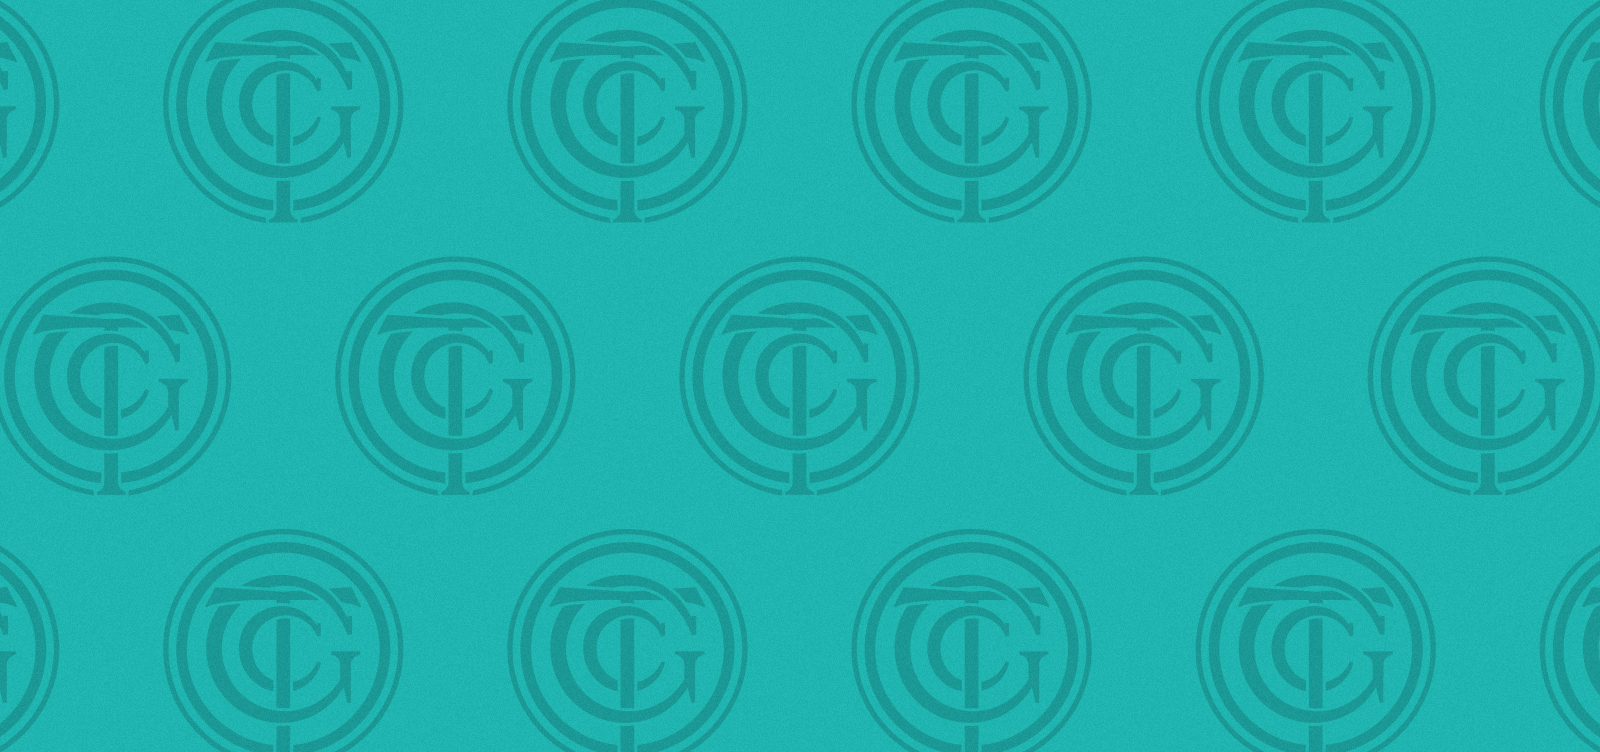 grand-central-terminal-logo-bryan-patrick-todd-02.jpg